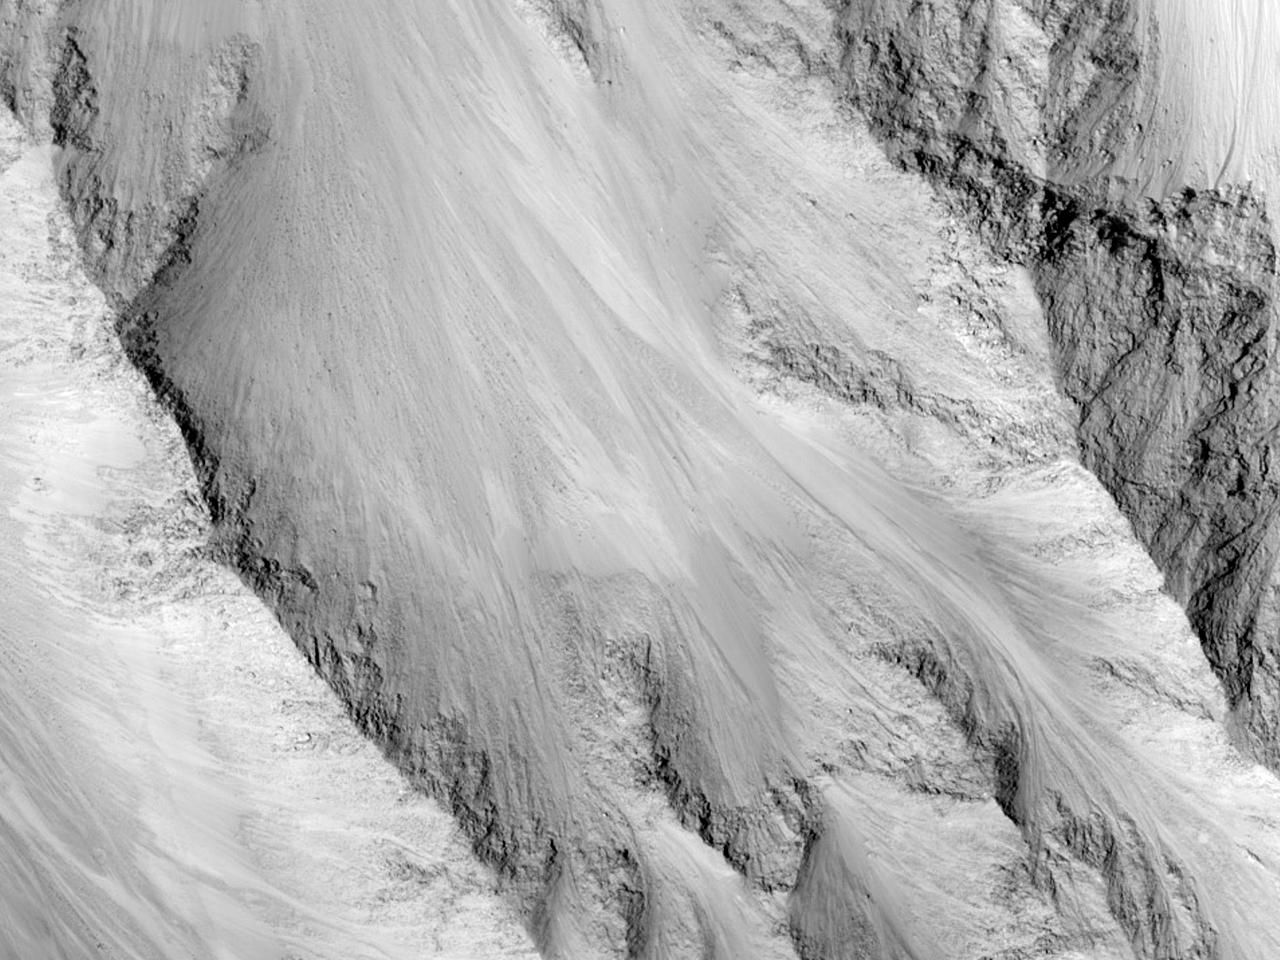 Overvåkingsbilde fra skråninger i Eos Chasma